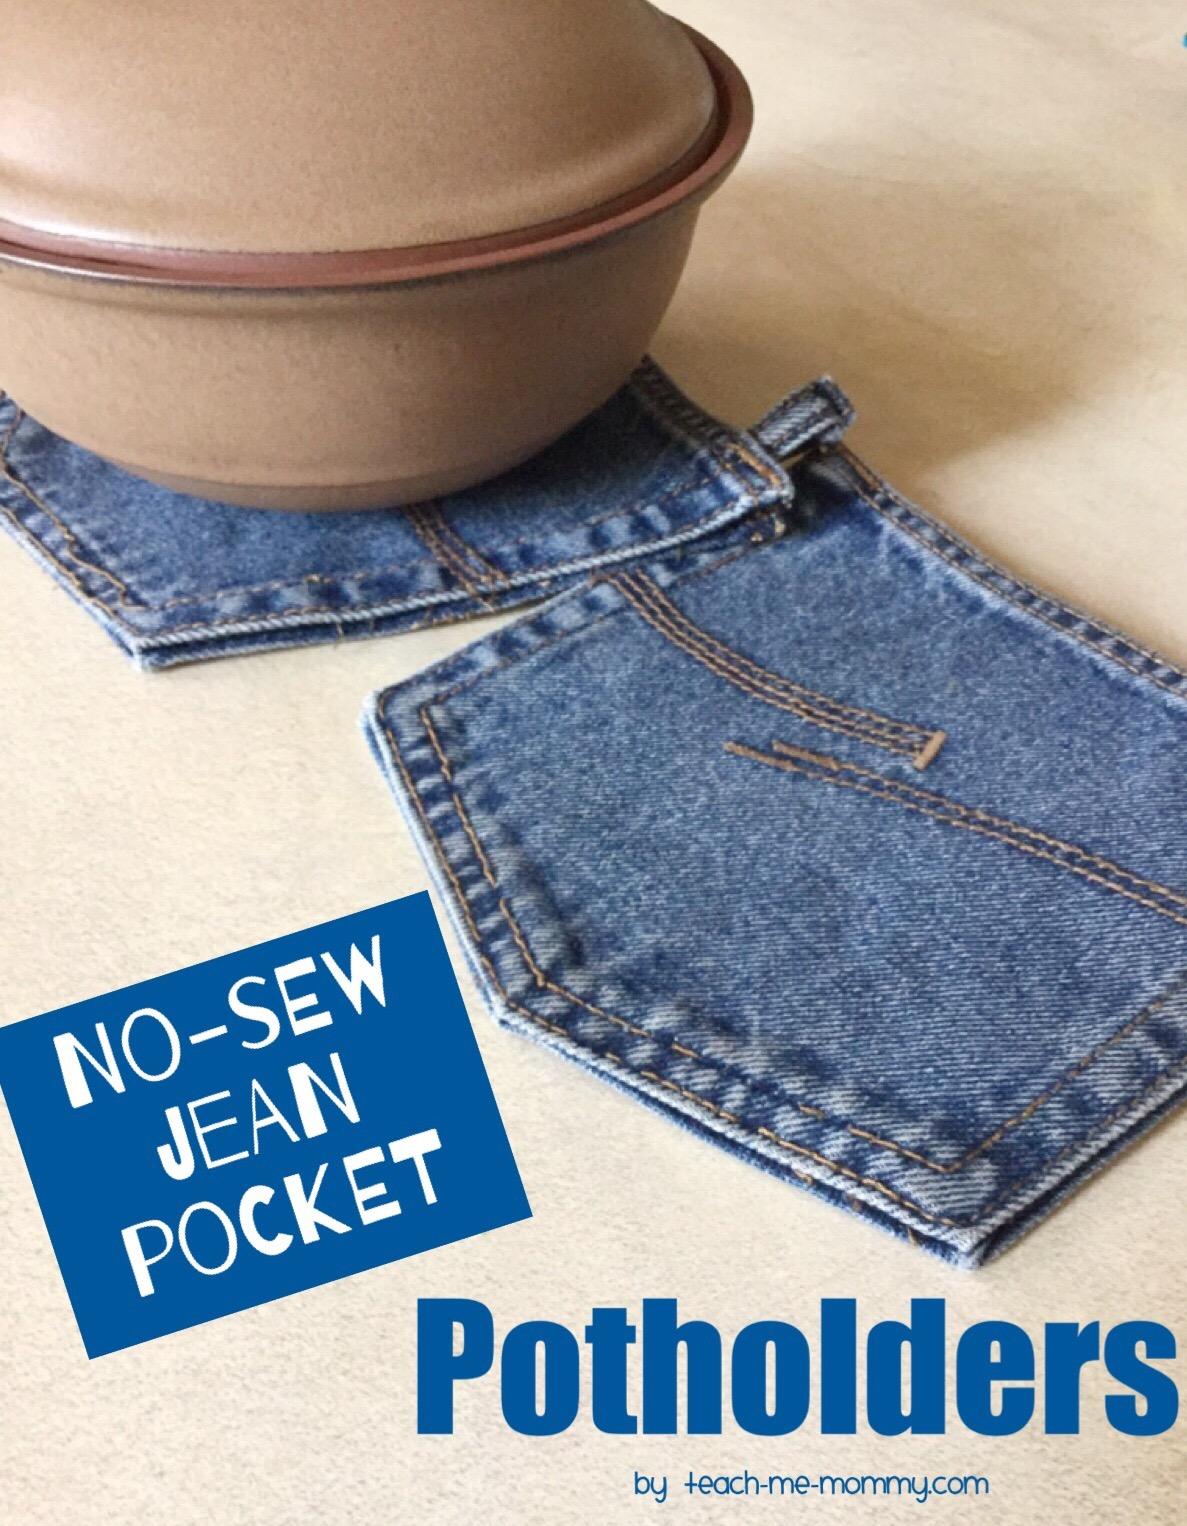 No Sew Jean Pocket Potholders Teach Me Mommy